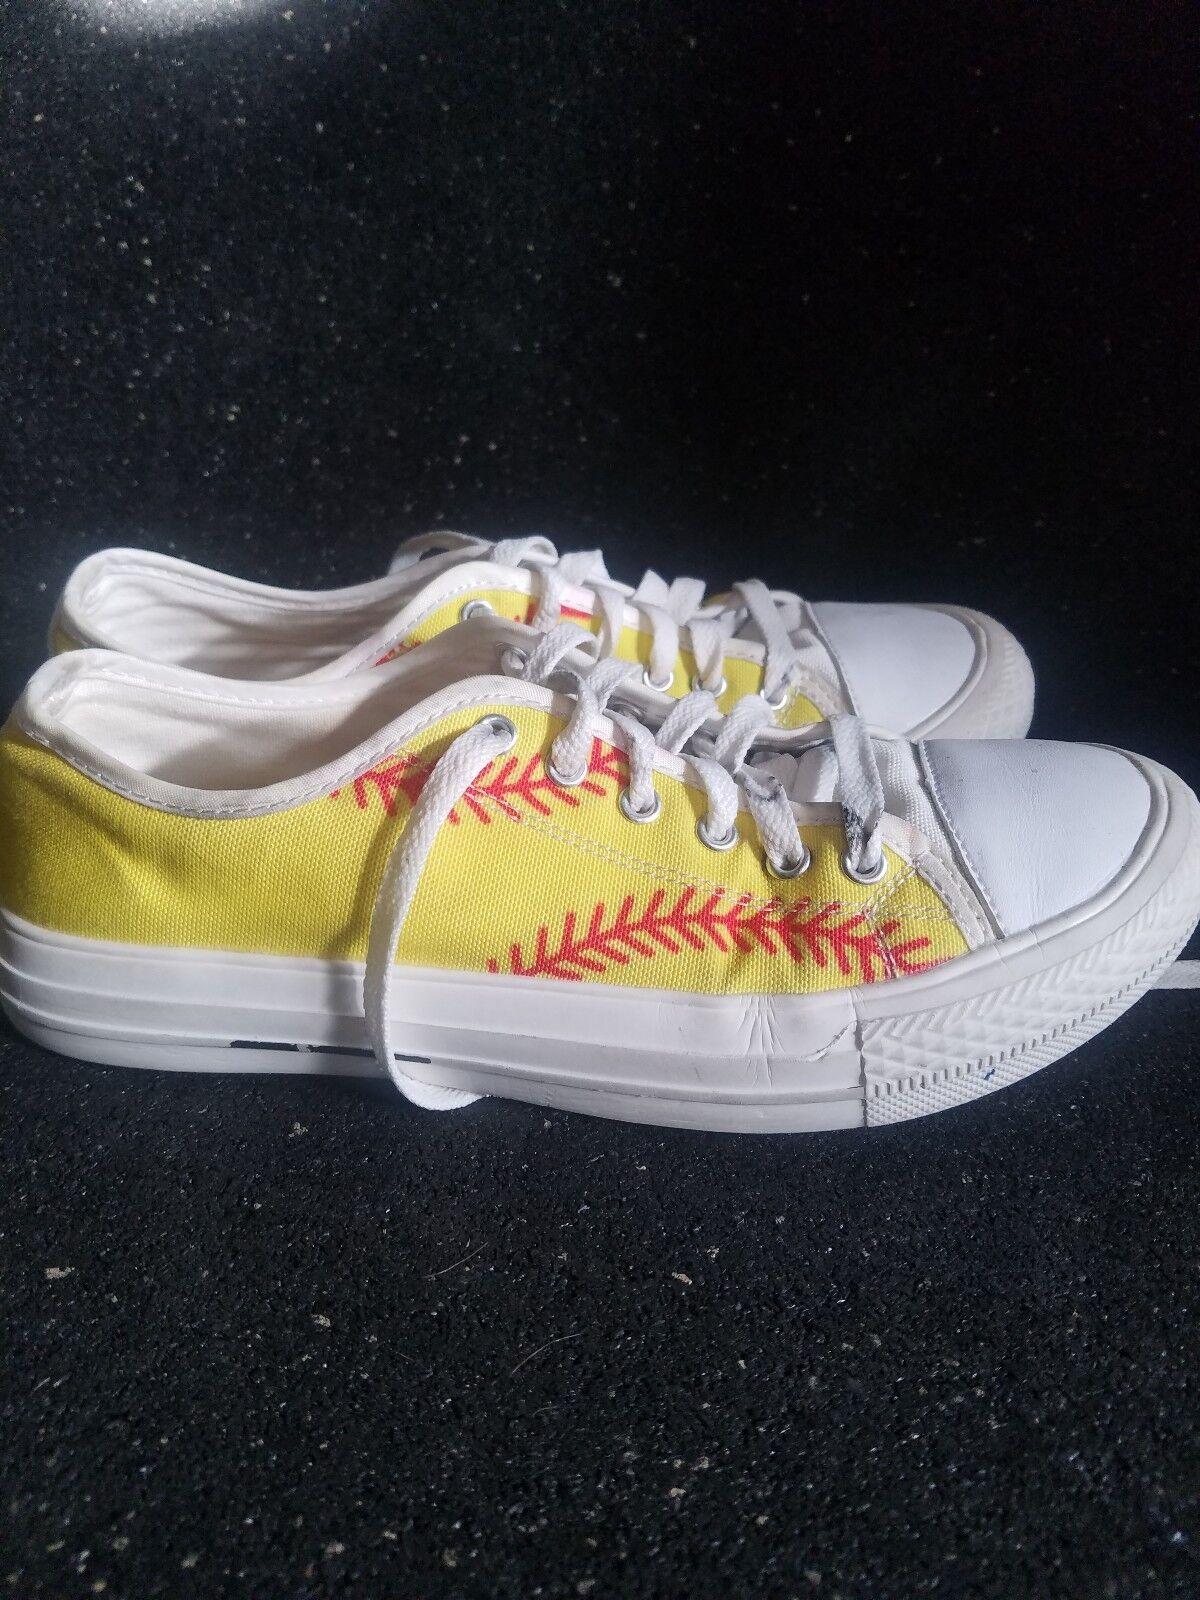 Softball scarpe scarpe da ginnastica donna Dimensione 7